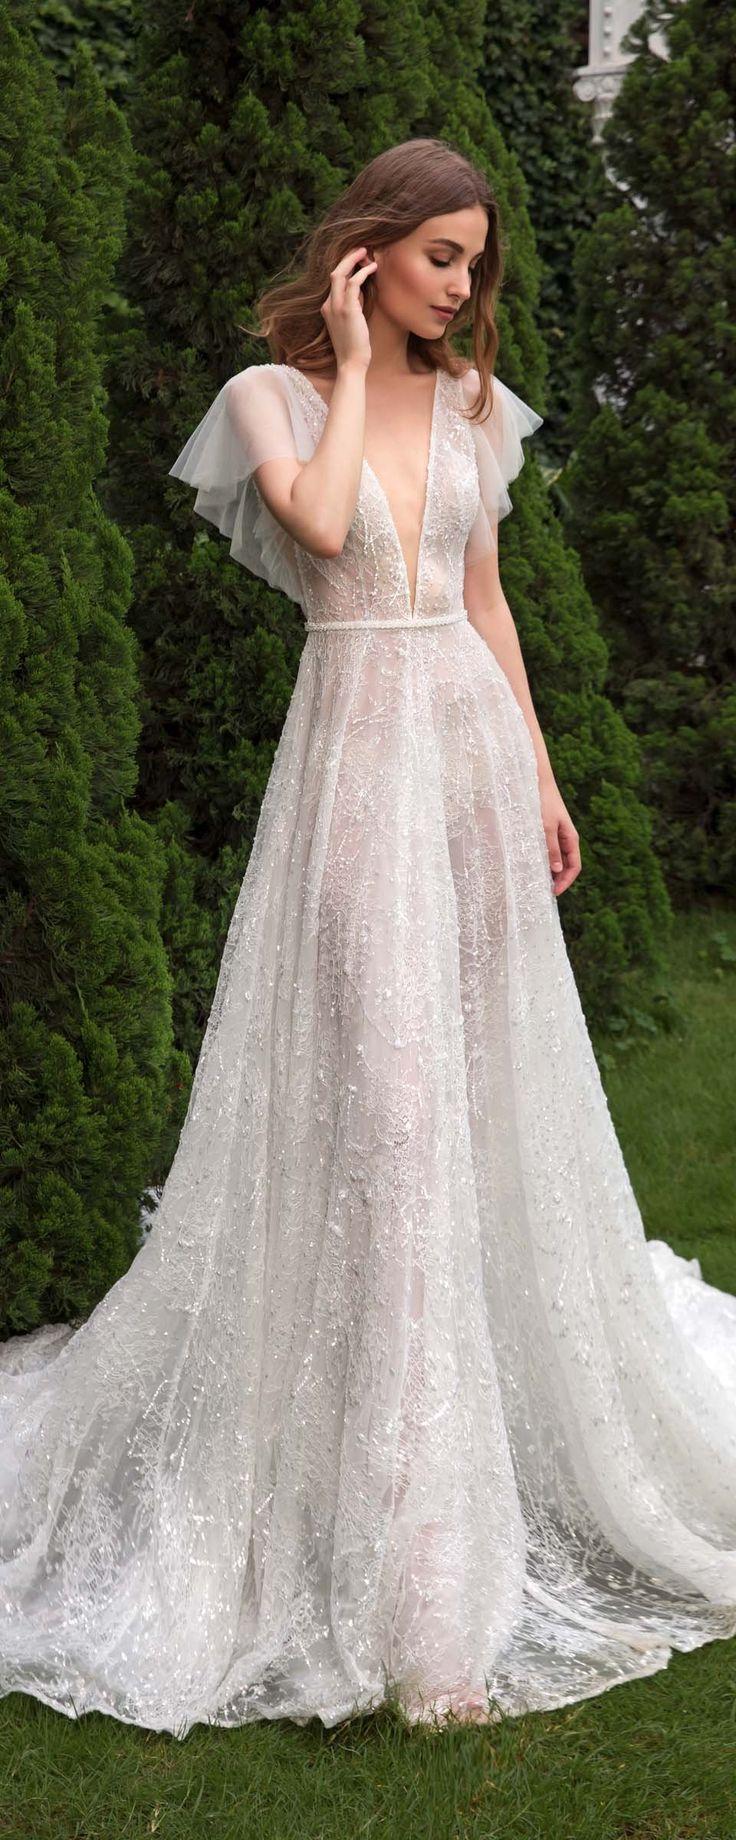 Dany tabet springsummer 2021 bridal in 2020 wedding